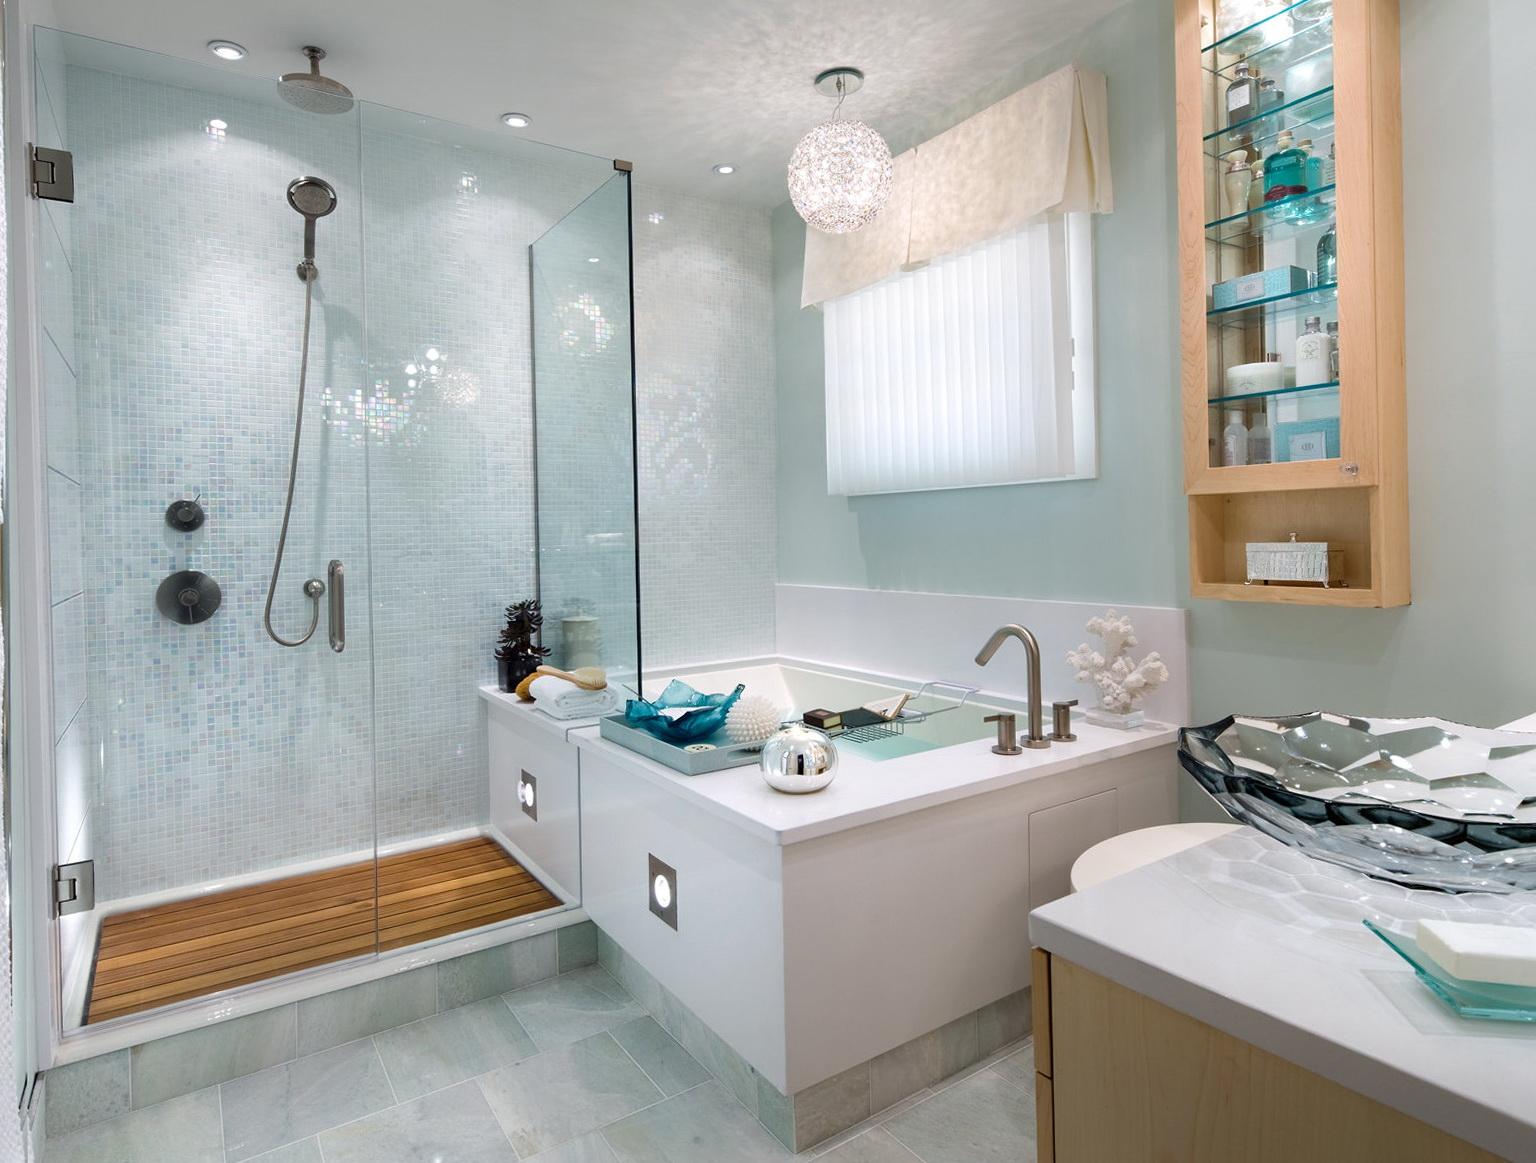 Hgtv Bathroom Remodel Pictures